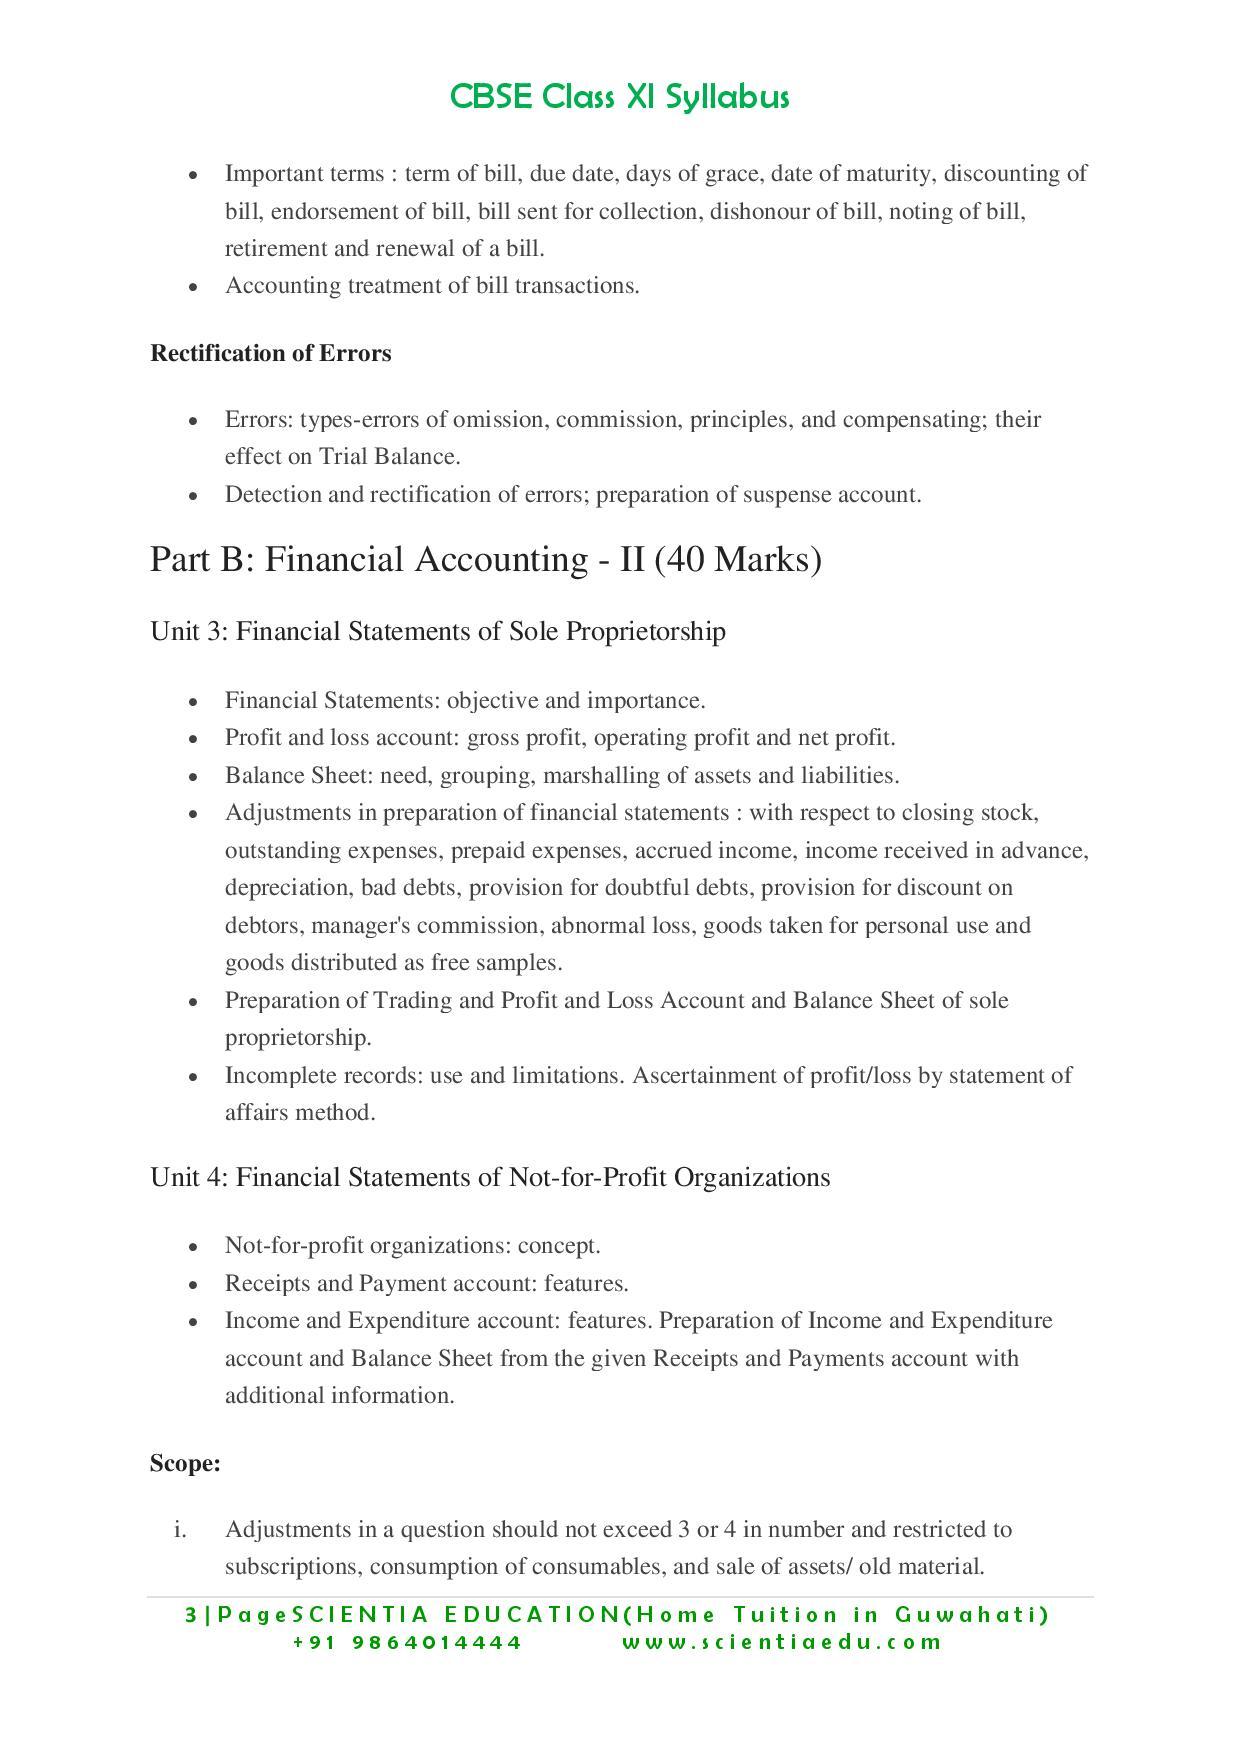 Class 11 Accountancy Syllabus CBSE - Educational Portal India